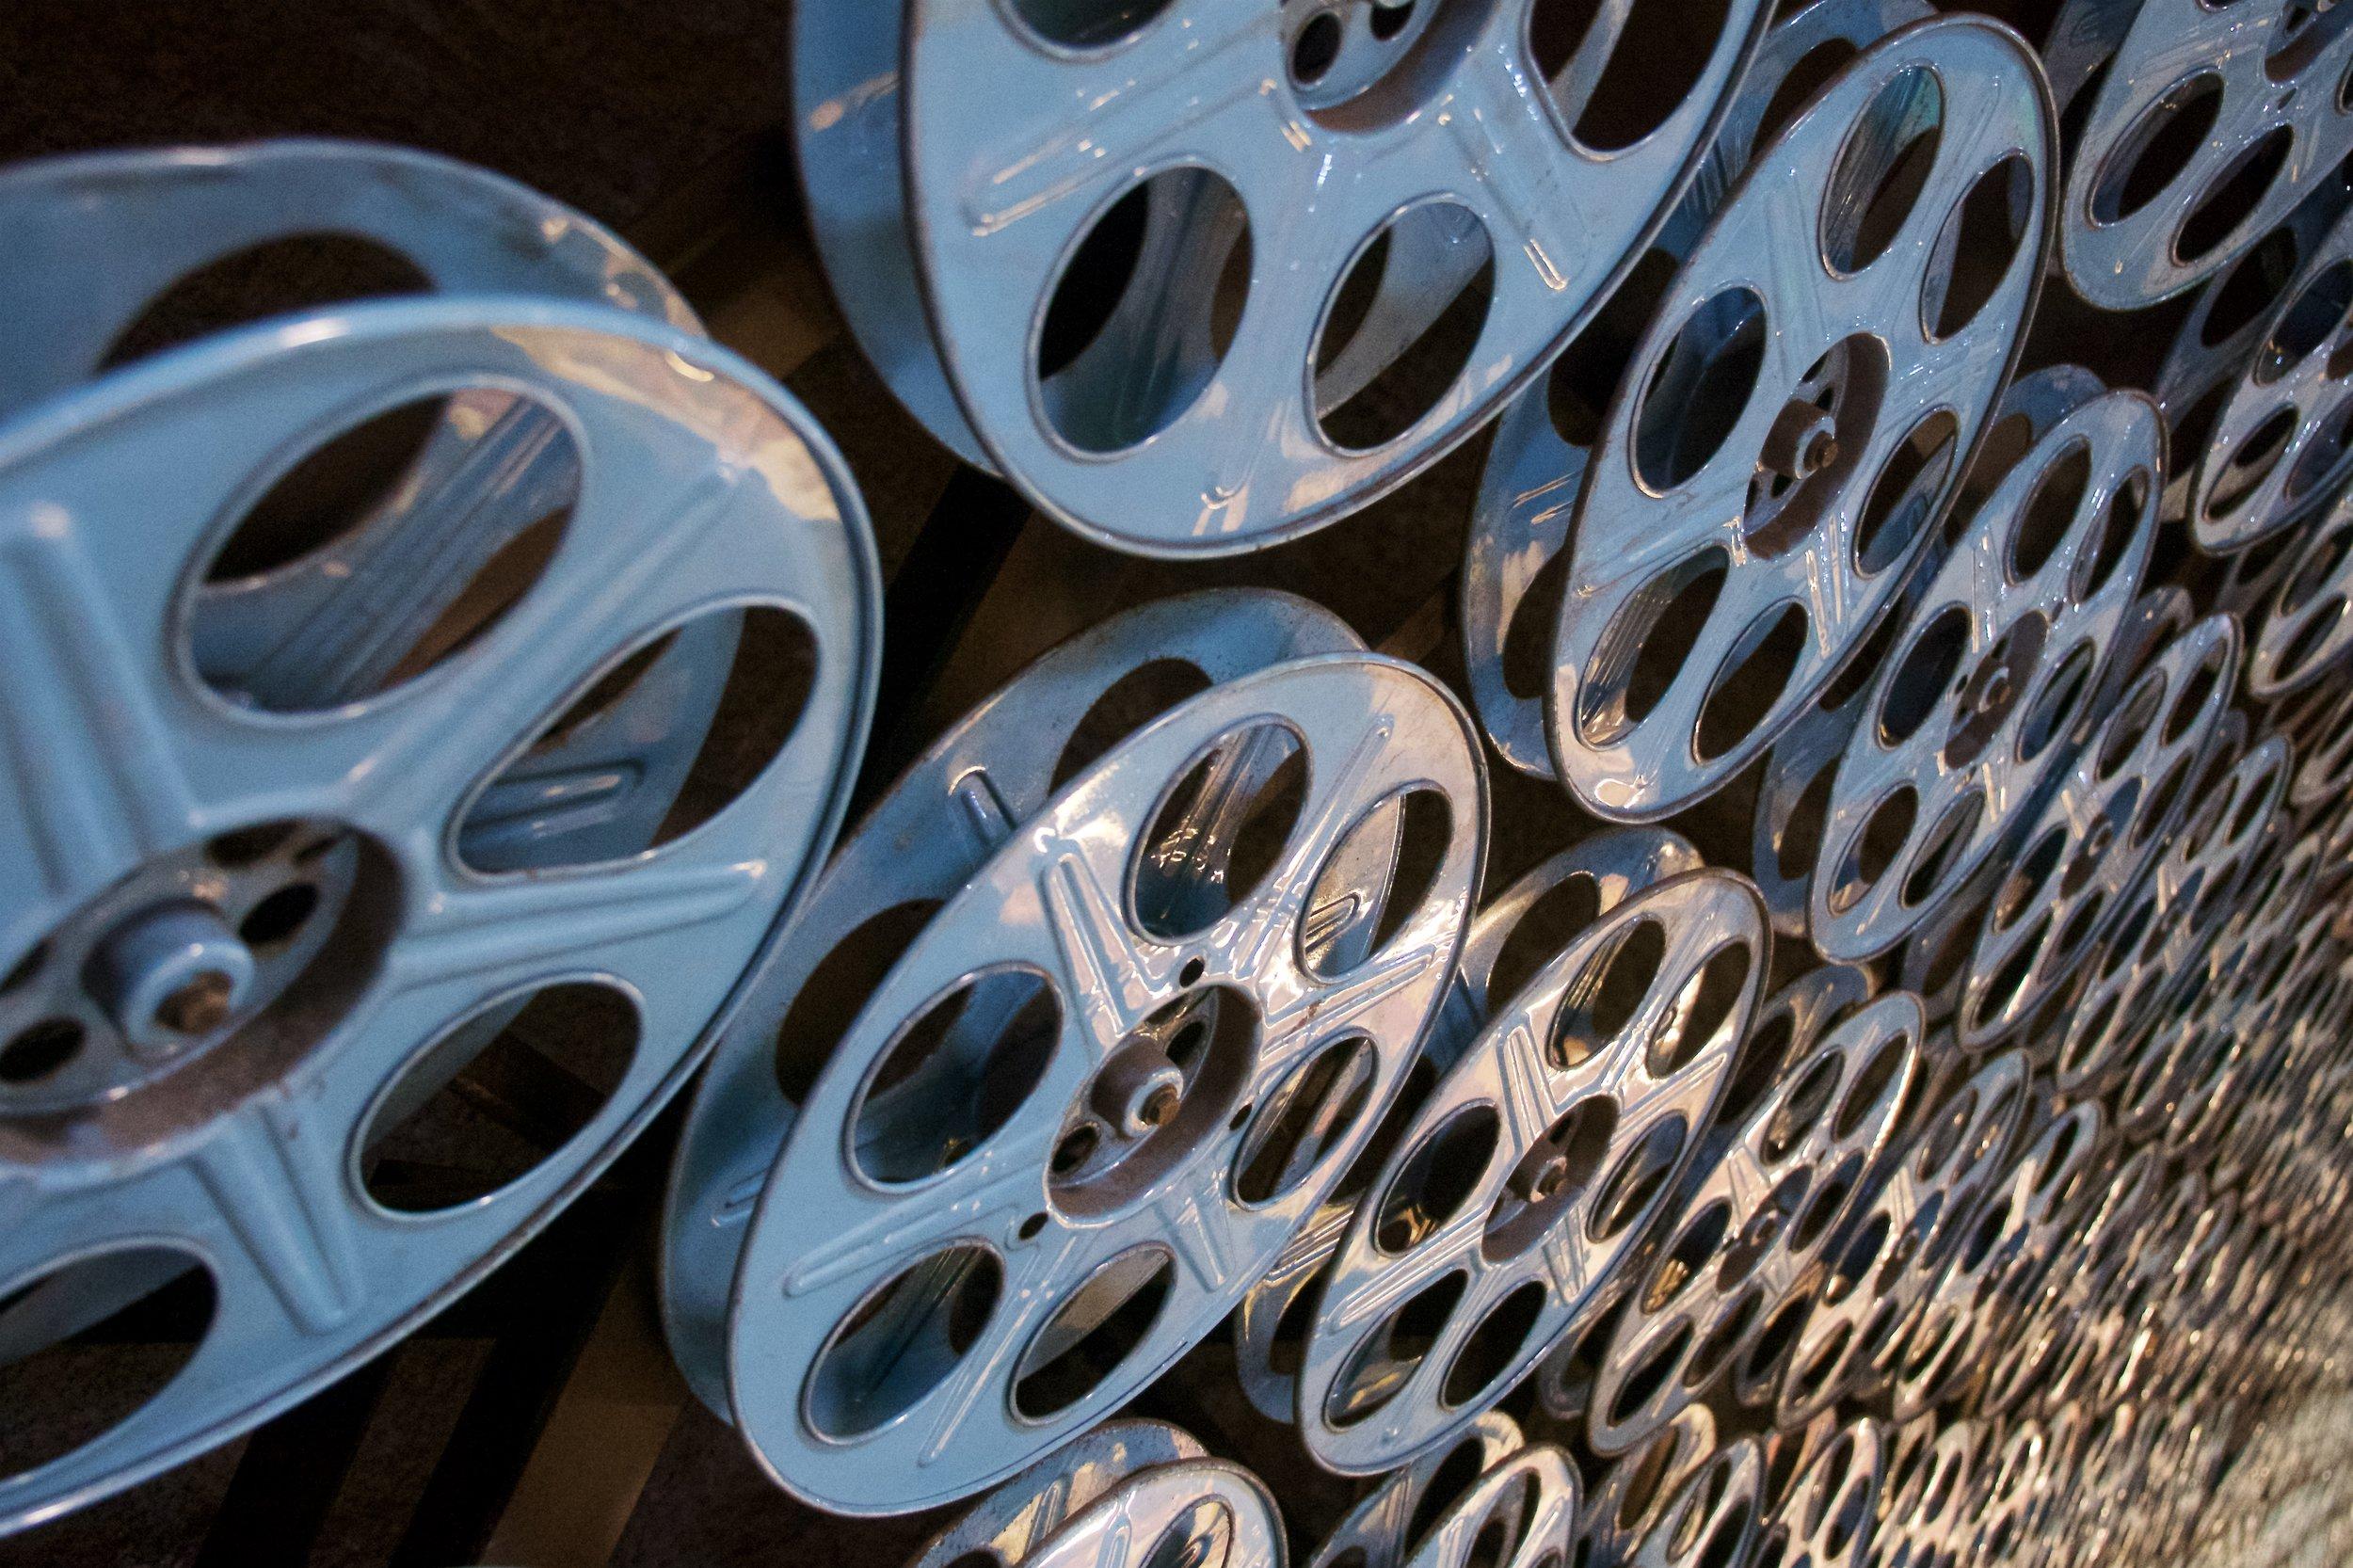 Film reels, Hollywood and Vine station